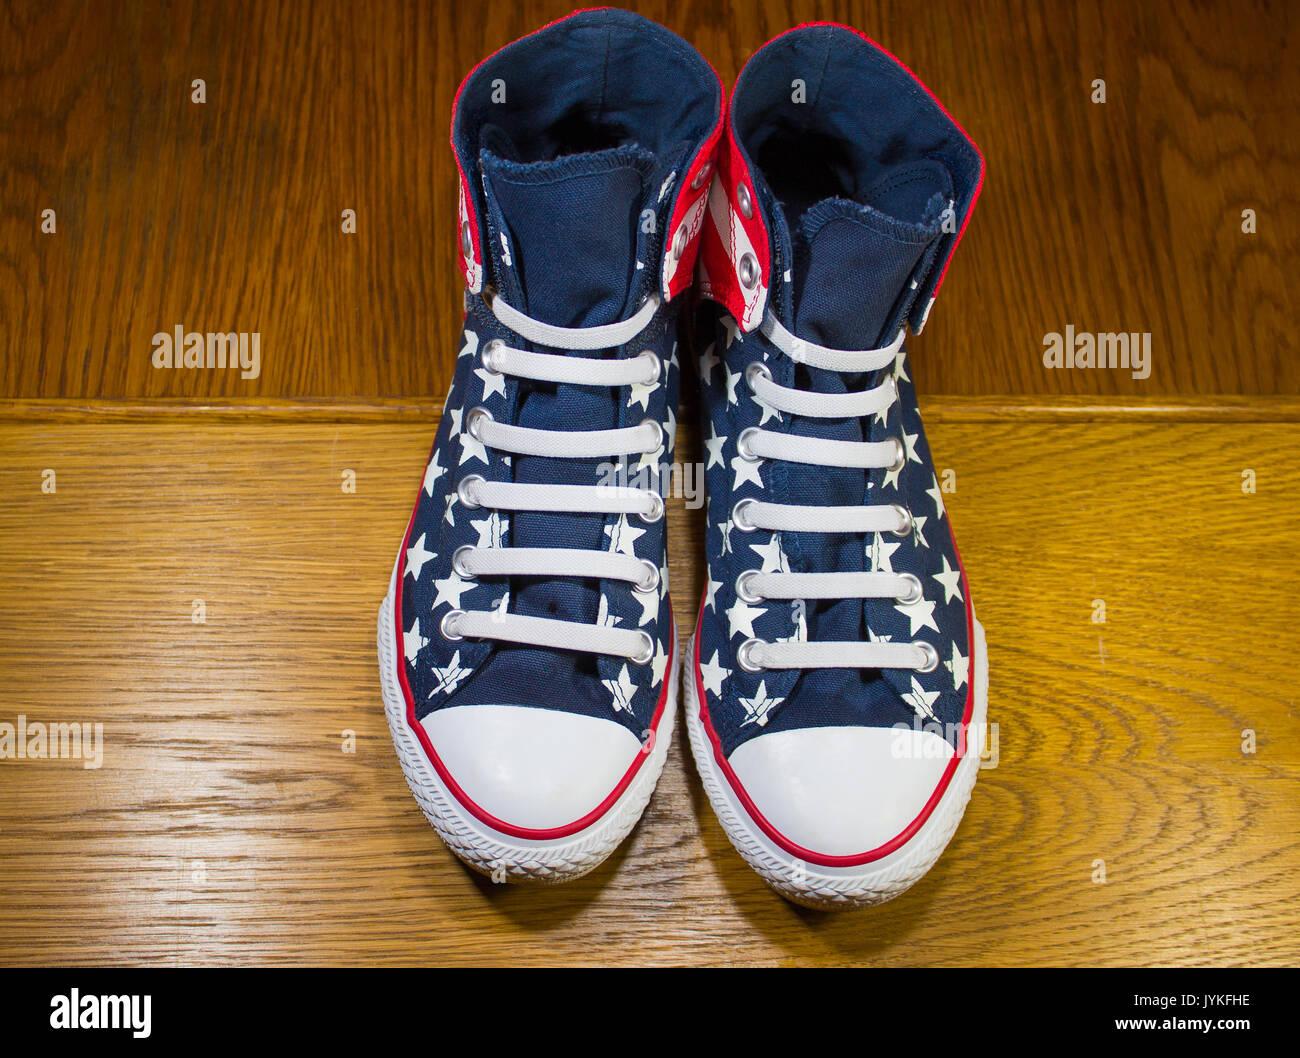 Dnipropetrovsk, Ukraine - June, 13 2016: All Star Converse sneake - Stock Image